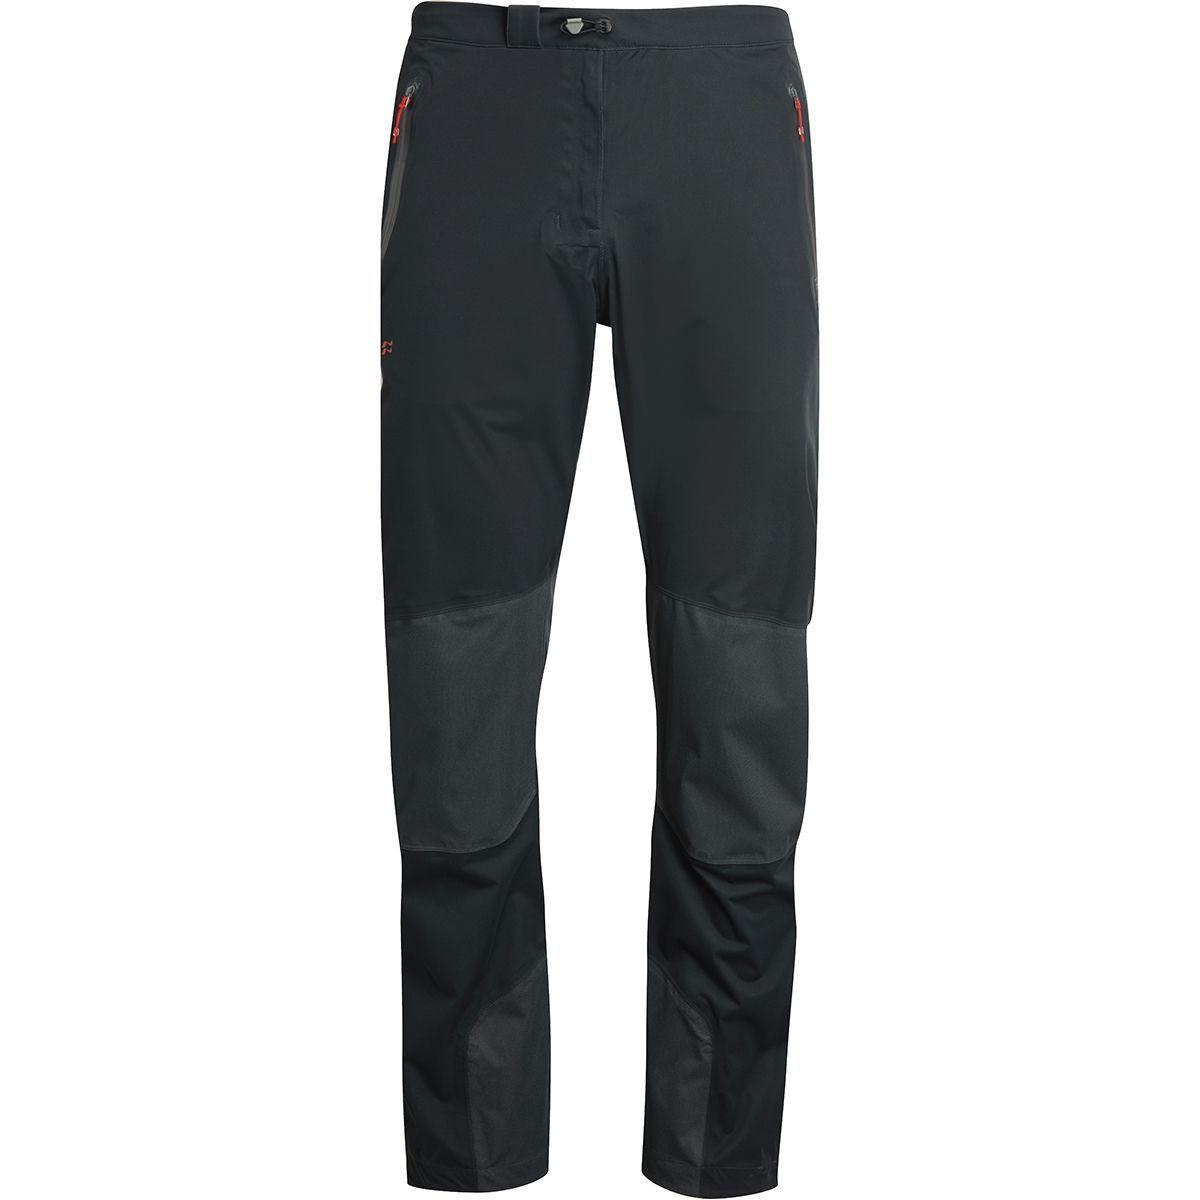 Rab Kinetic Alpine Pant - Men's